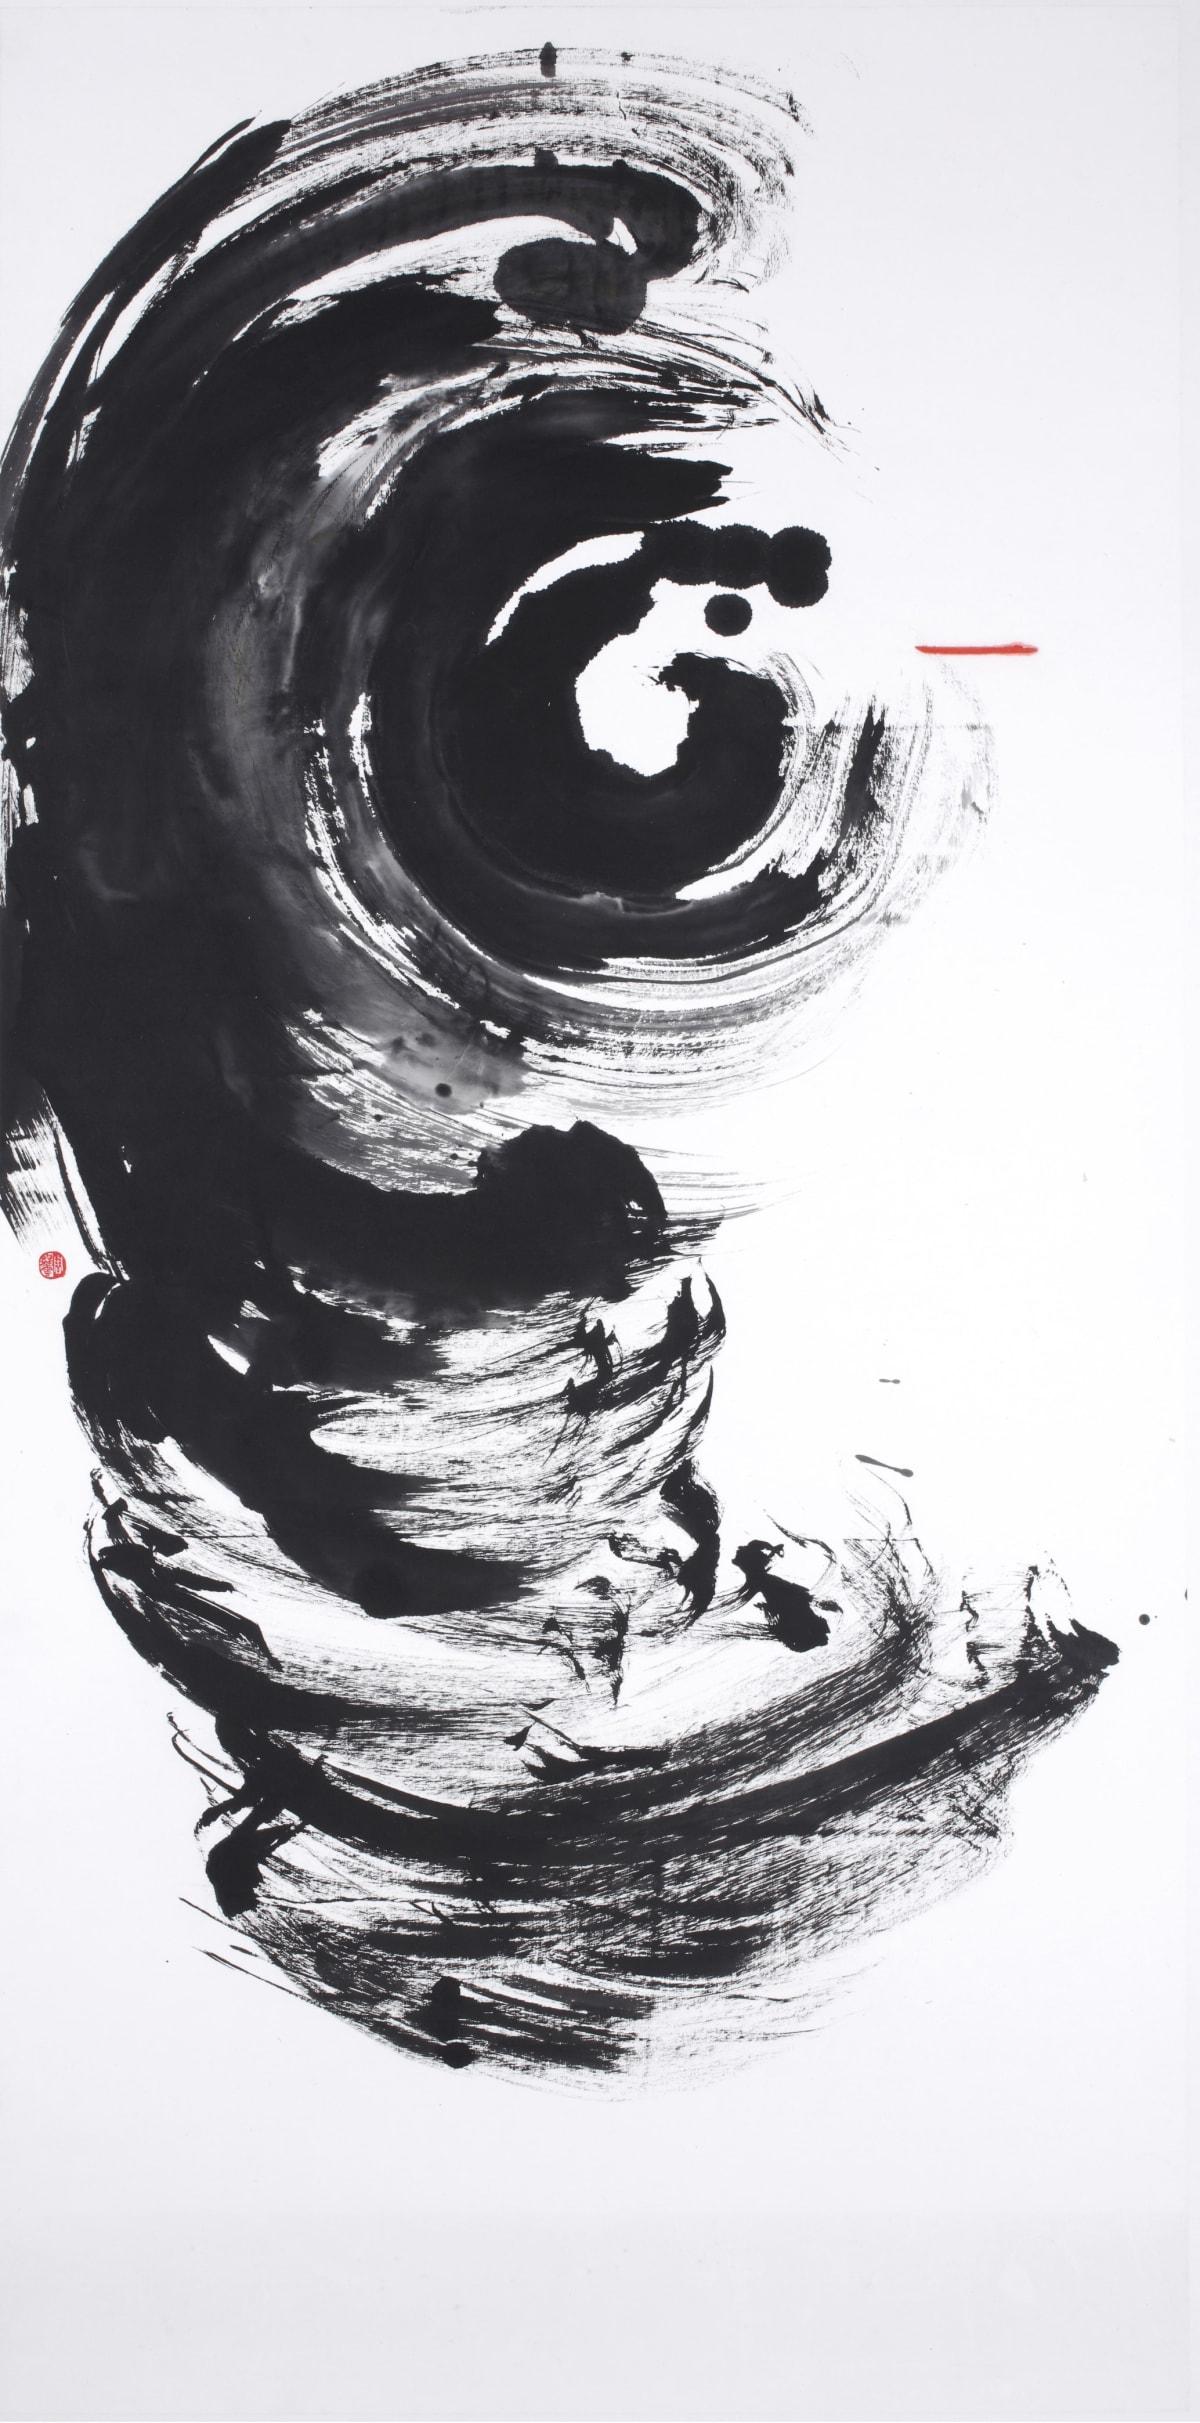 Irene Chou - Contemplation